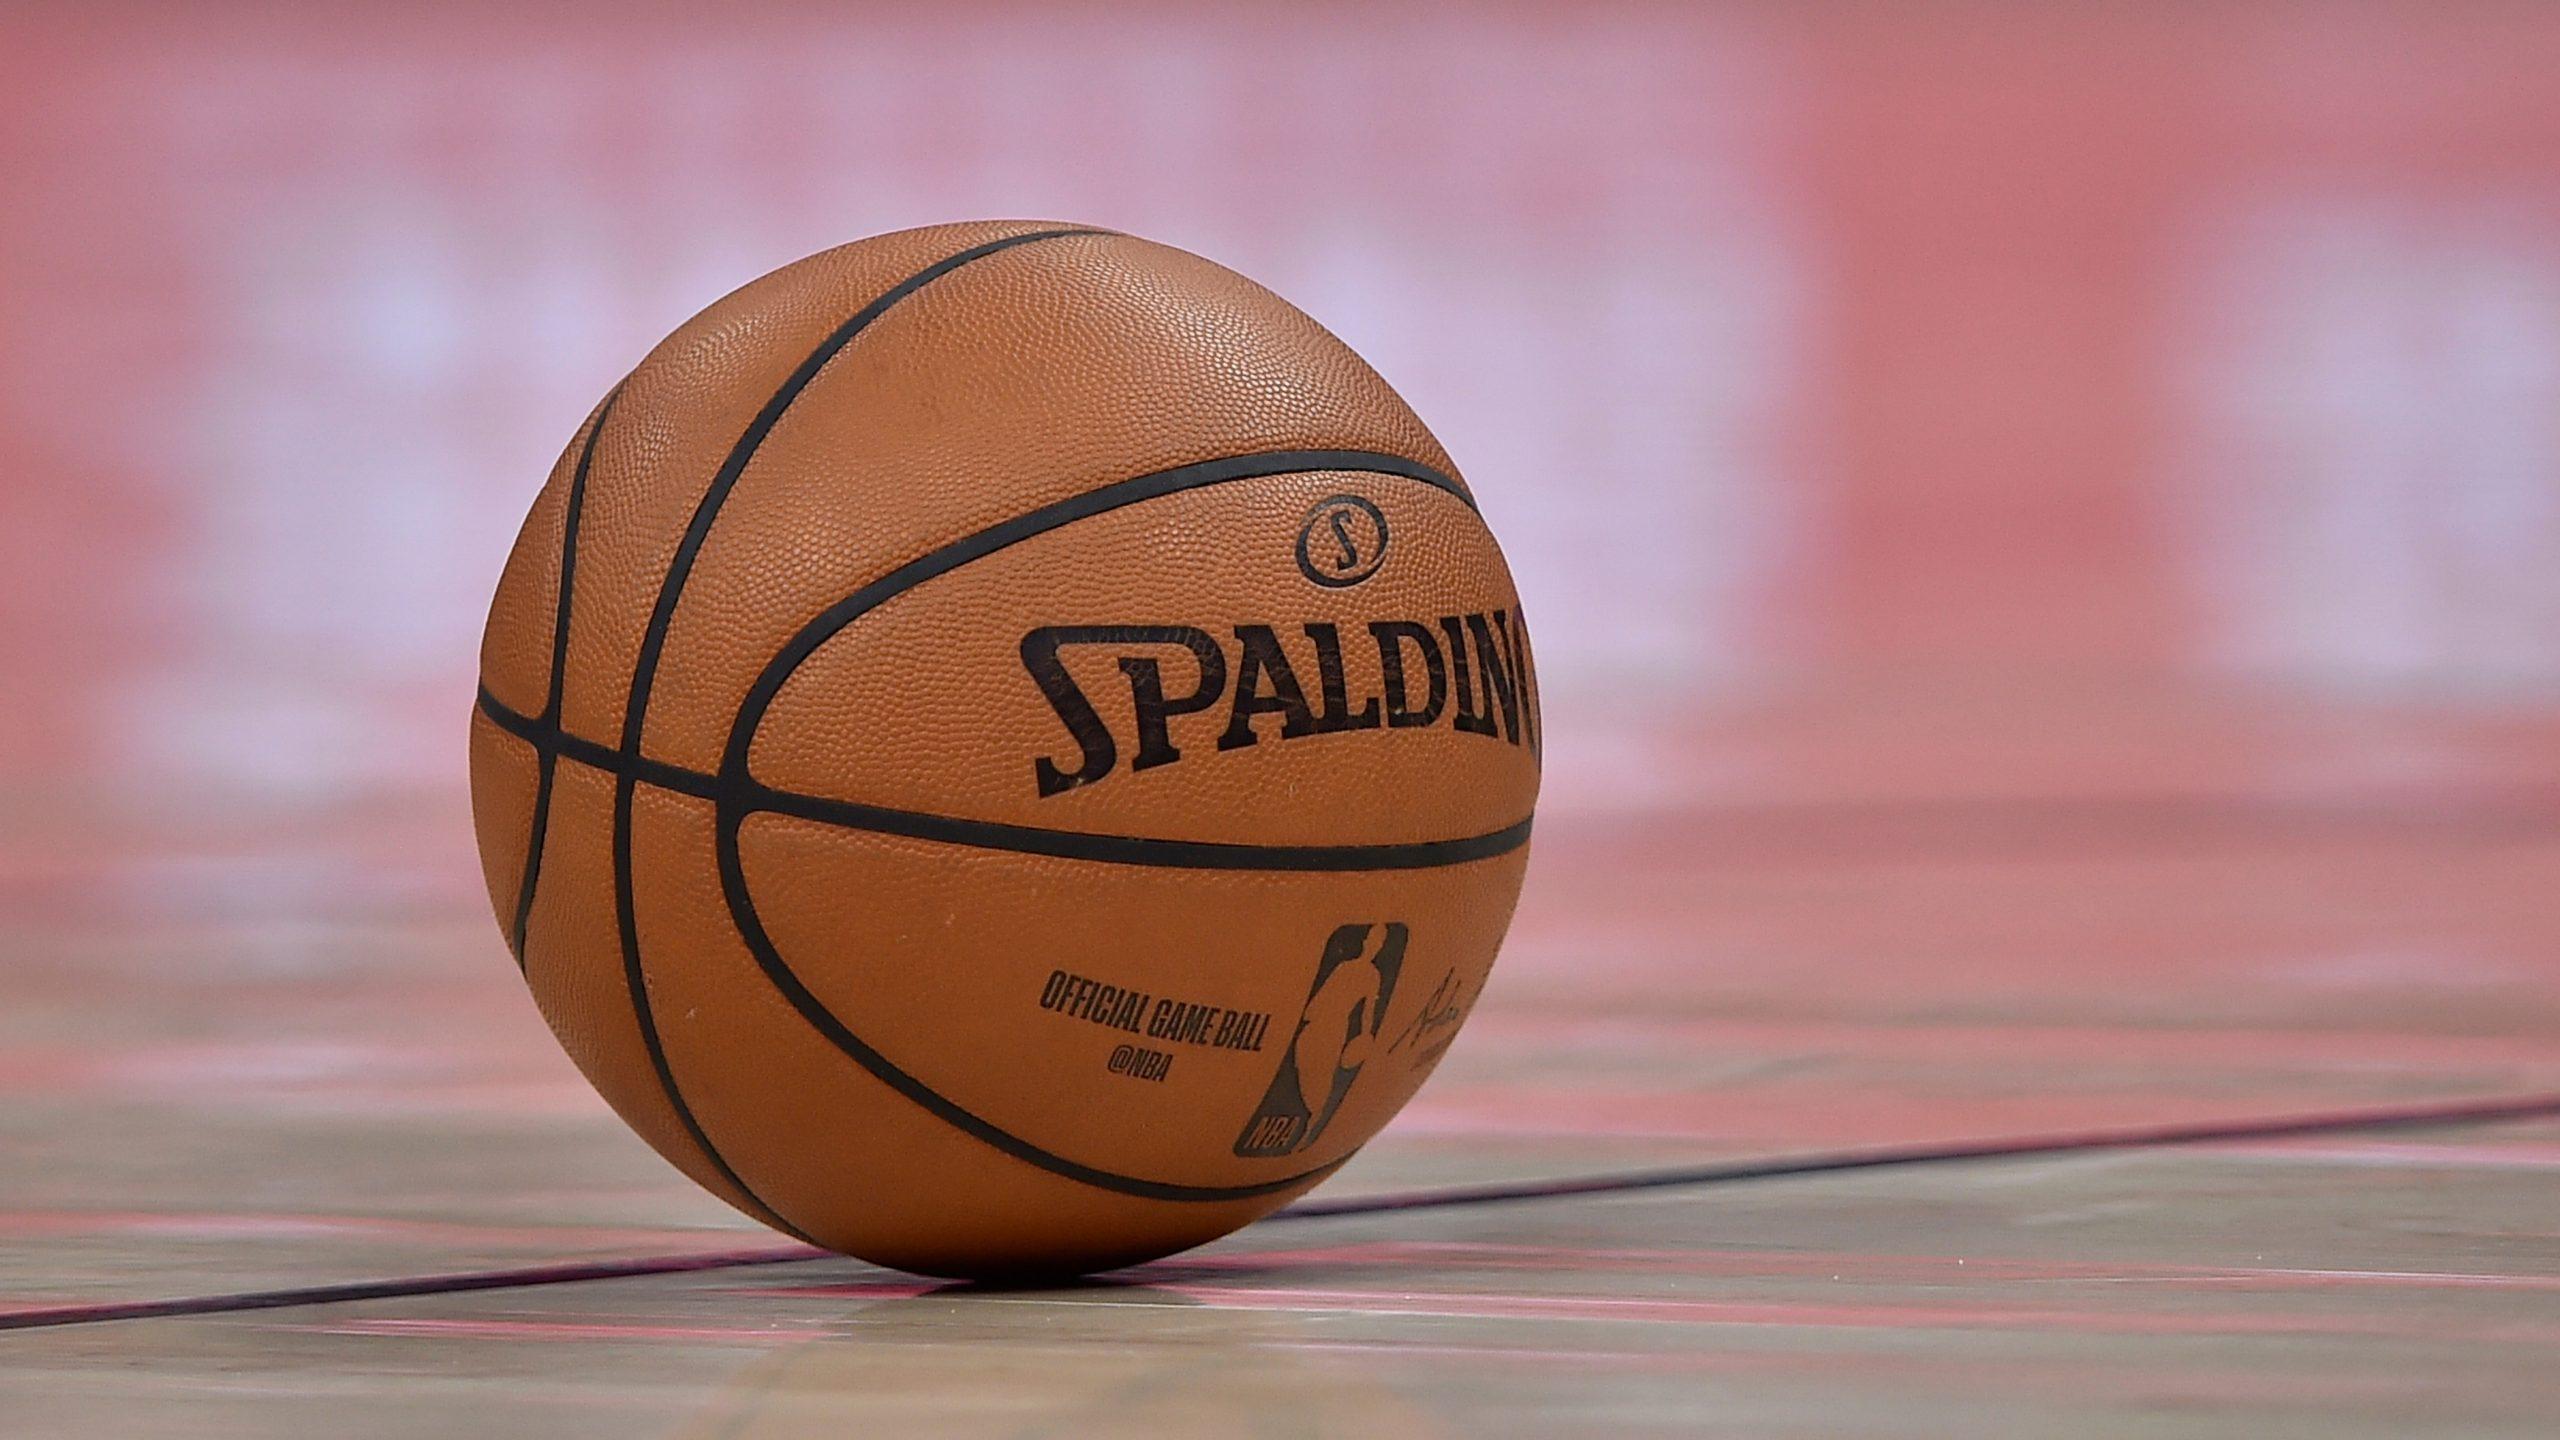 Malawi Basketball giants Bravehearts sign Tanzanian duo - Sports Leo